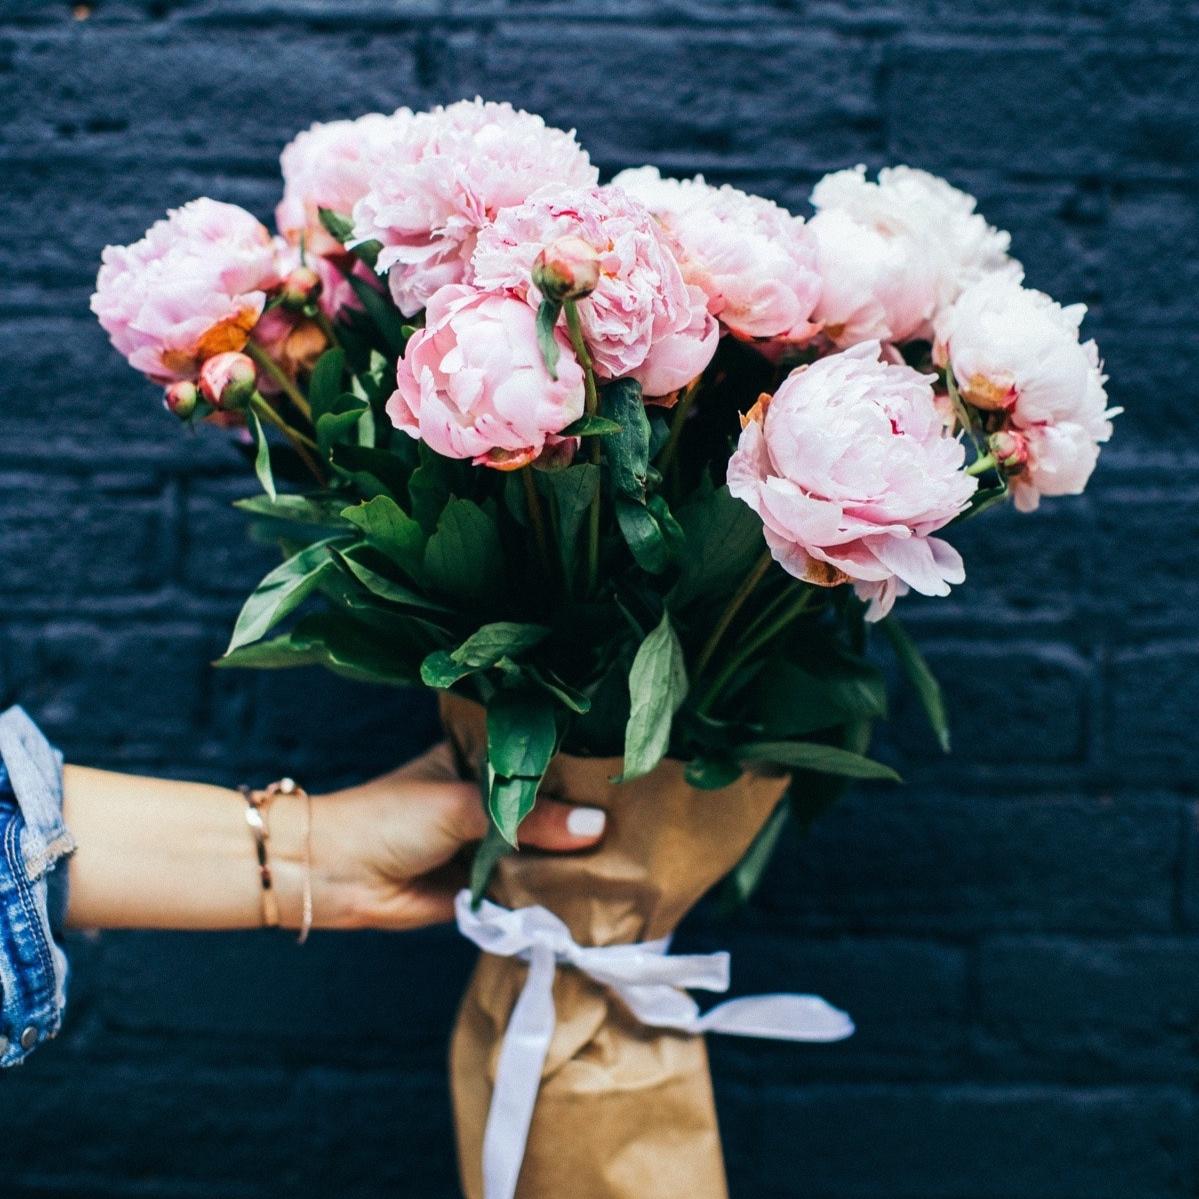 beautiful-beautiful-flowers-bloom-424670.jpg